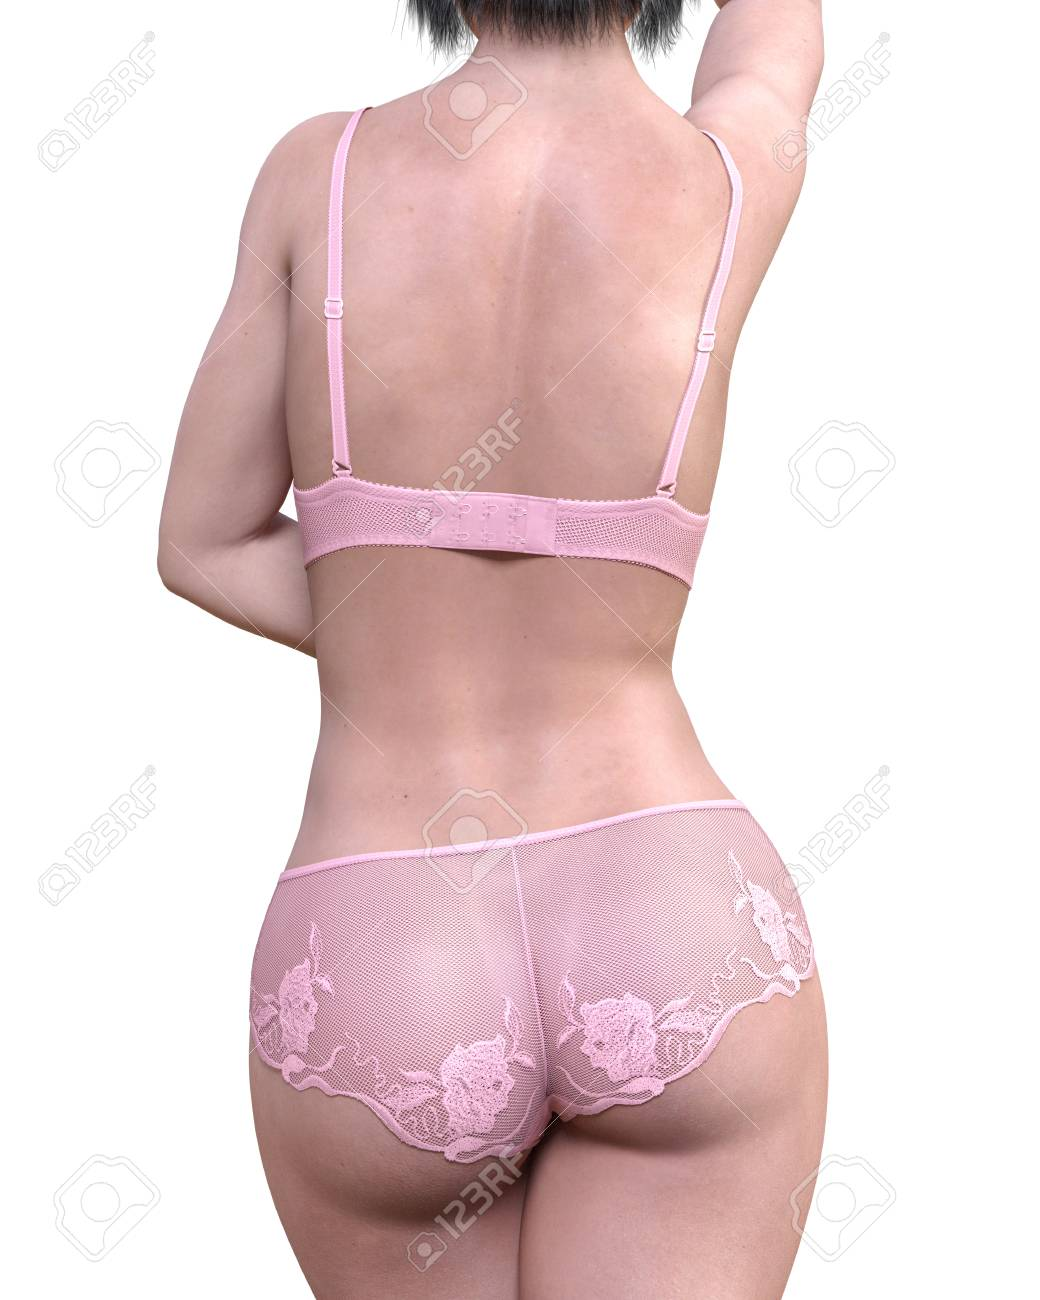 Chris pontius porn video